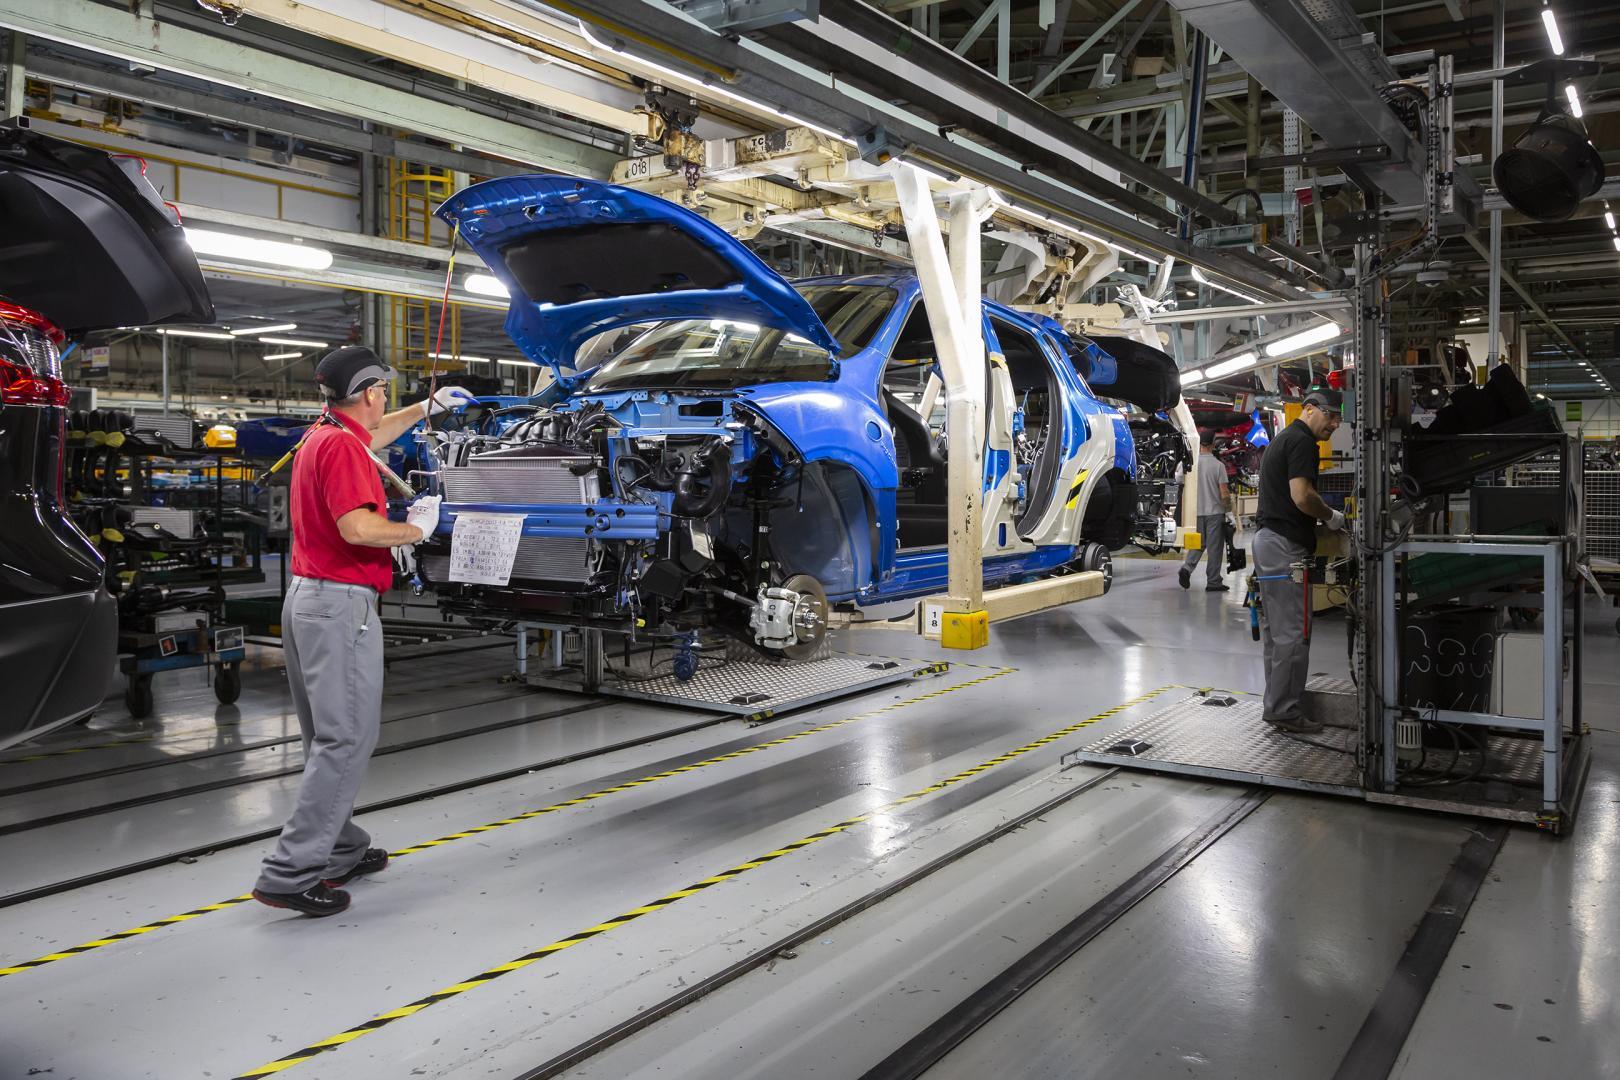 Miljoenste Nissan Juke in de Nissan-Fabriek